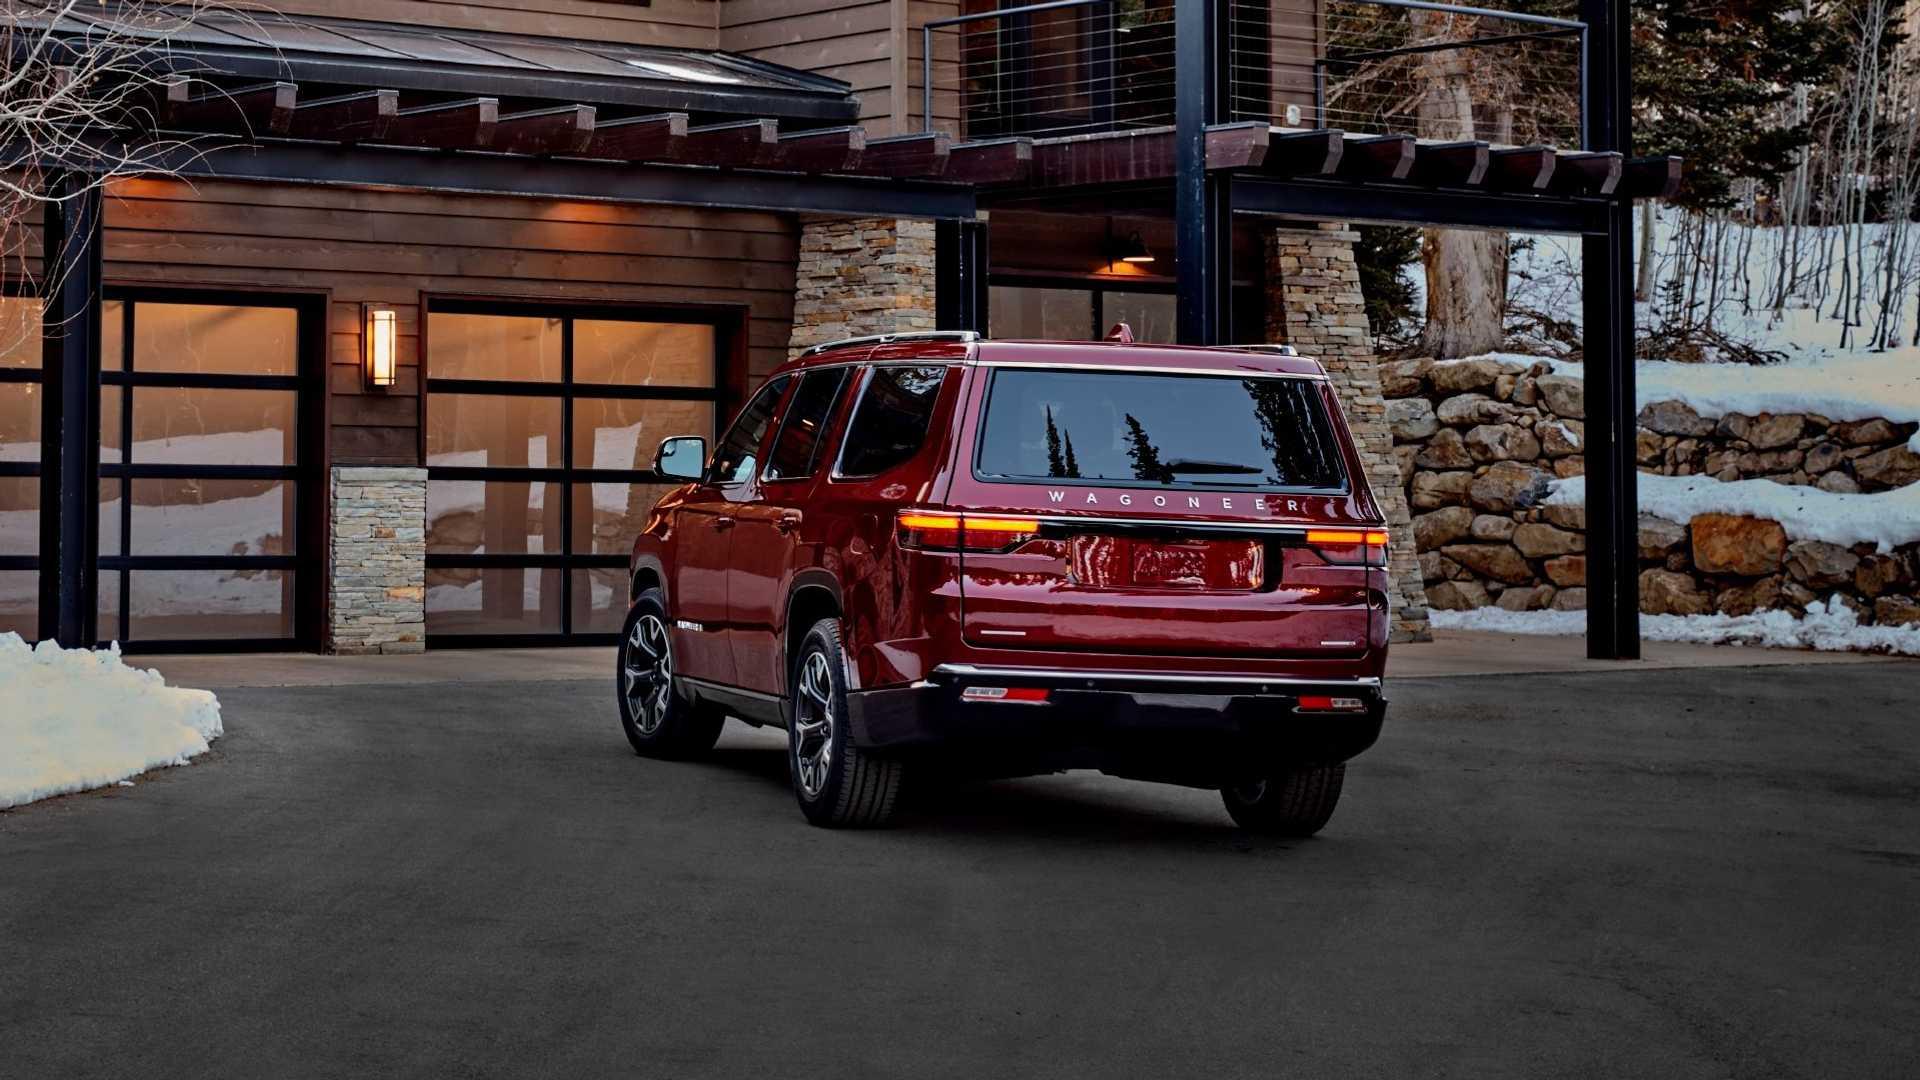 2022-jeep-wagoneer-exterior-rear-quarter-1